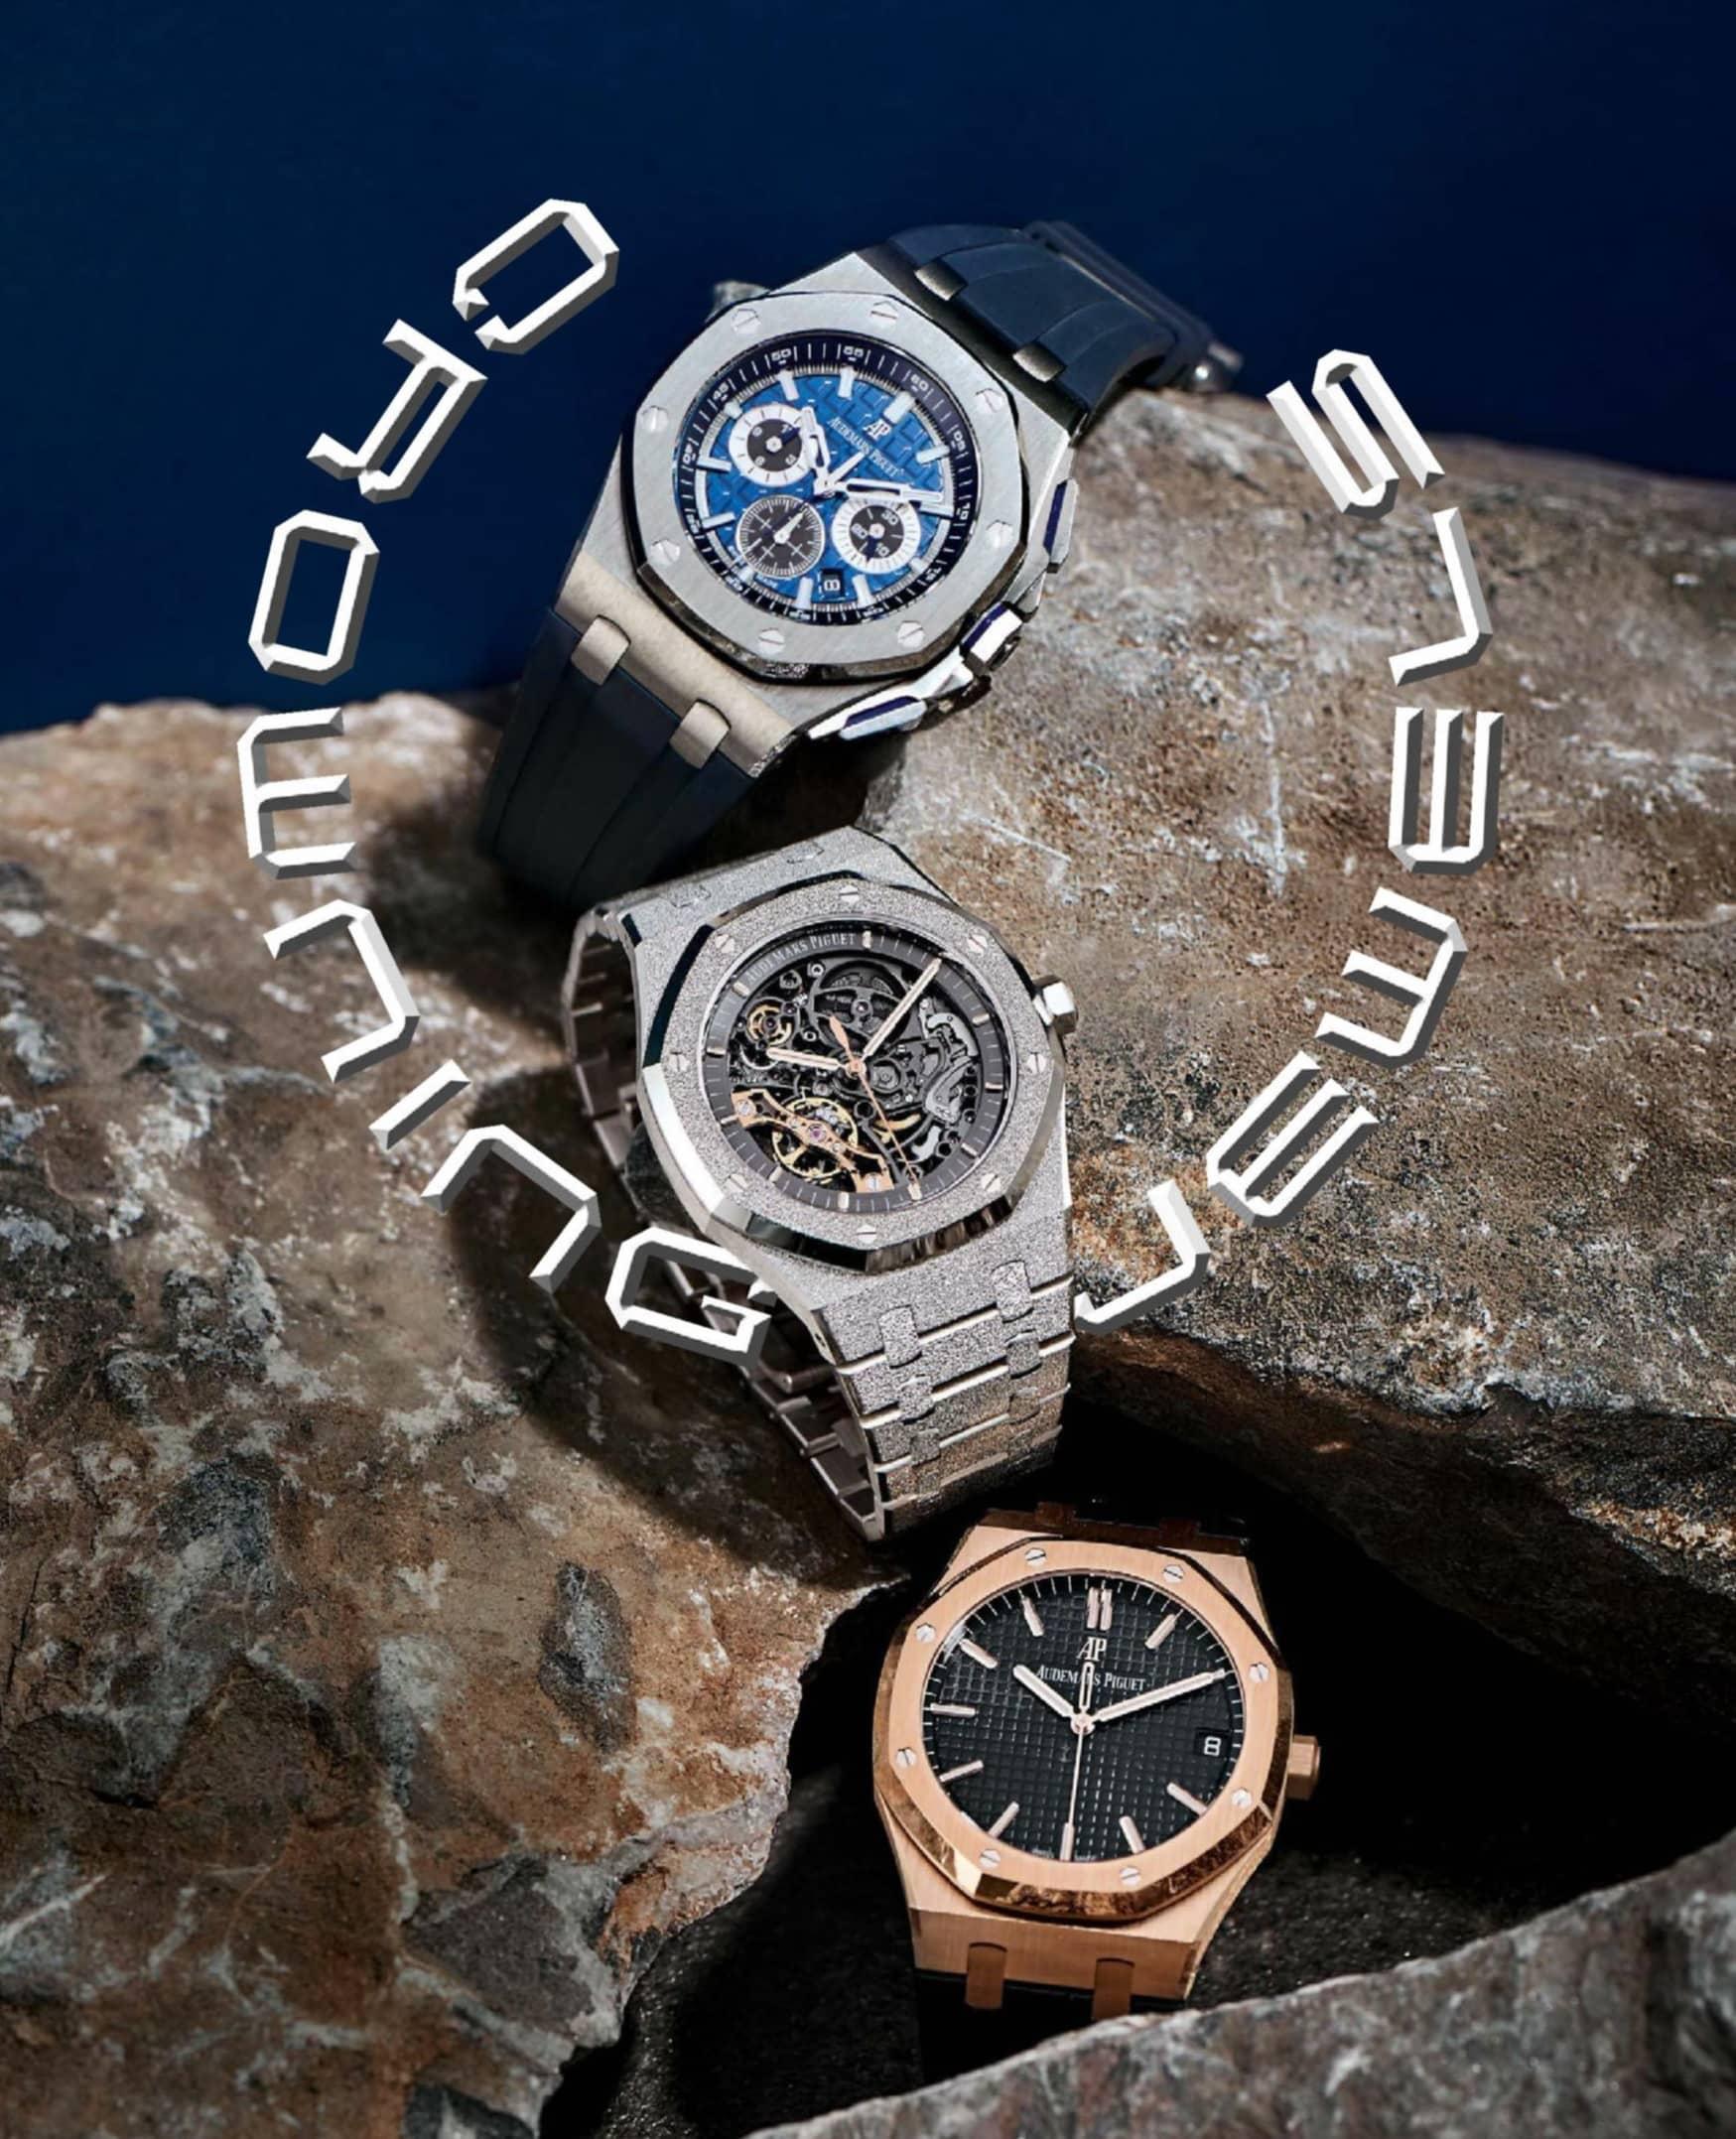 GQ Watch - Crowning Jewels